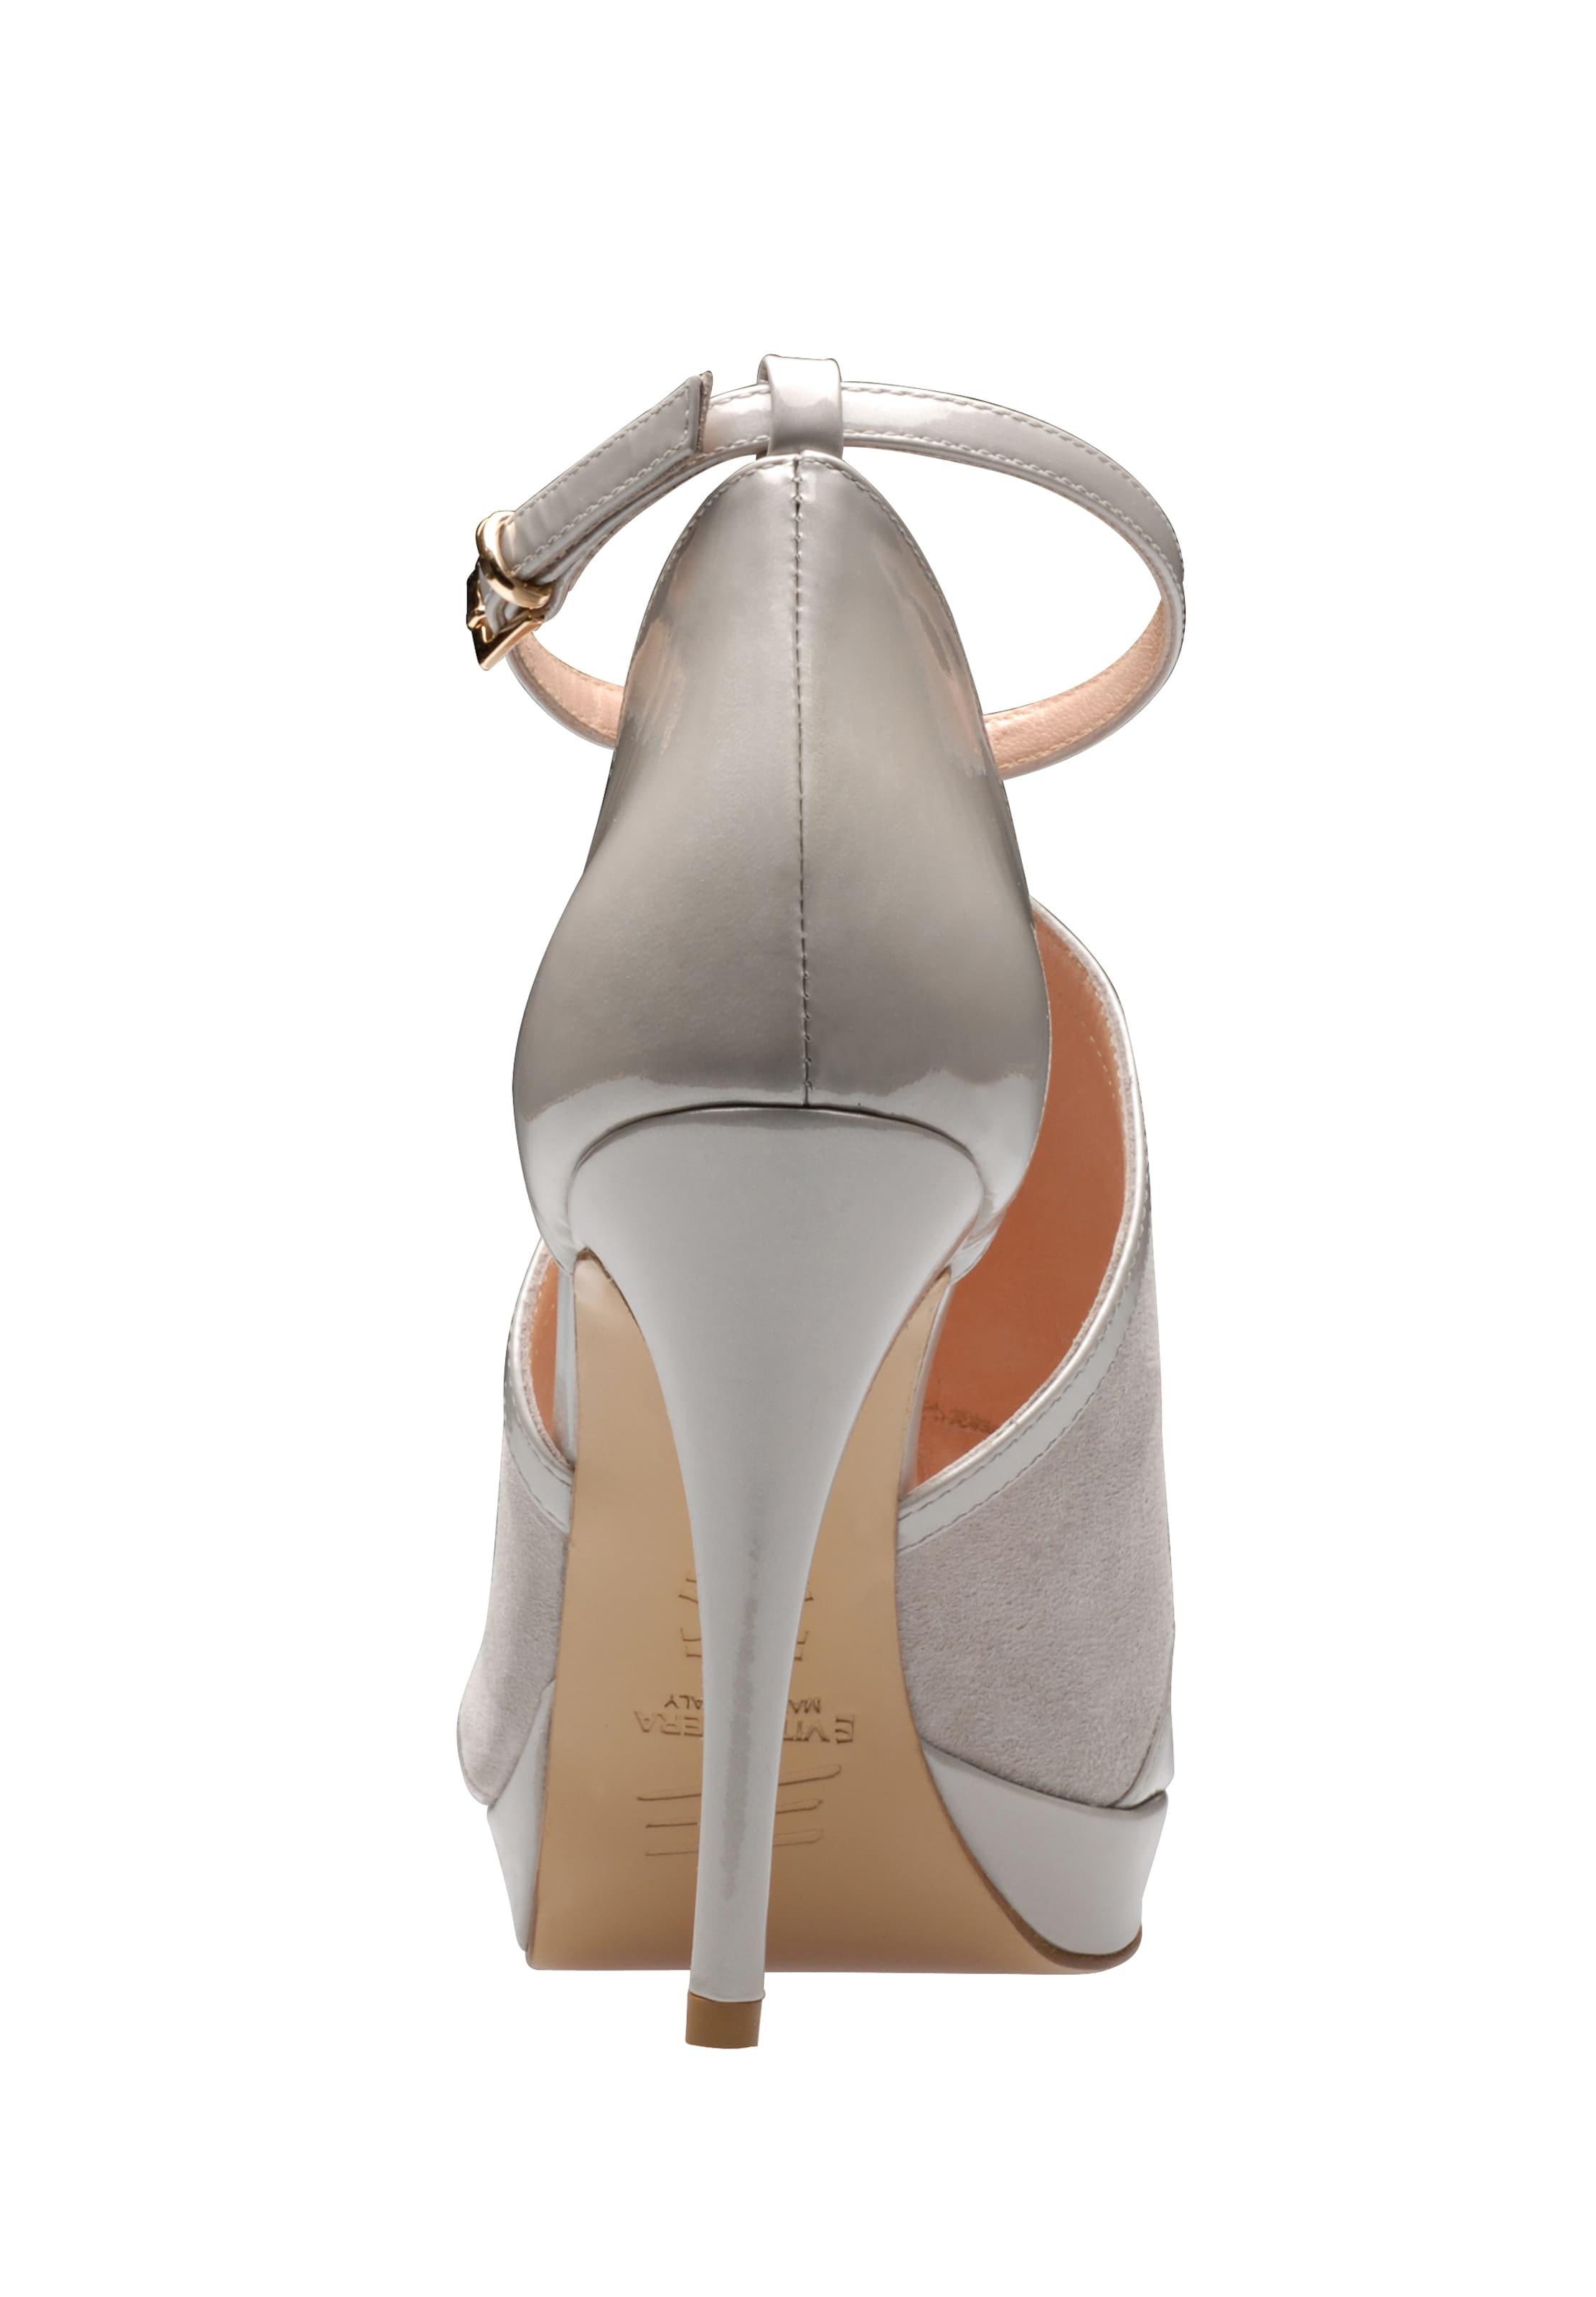 In Sandalette Silbergrau Evita Sandalette Evita In Silbergrau Sandalette Evita In c1JKlTF3